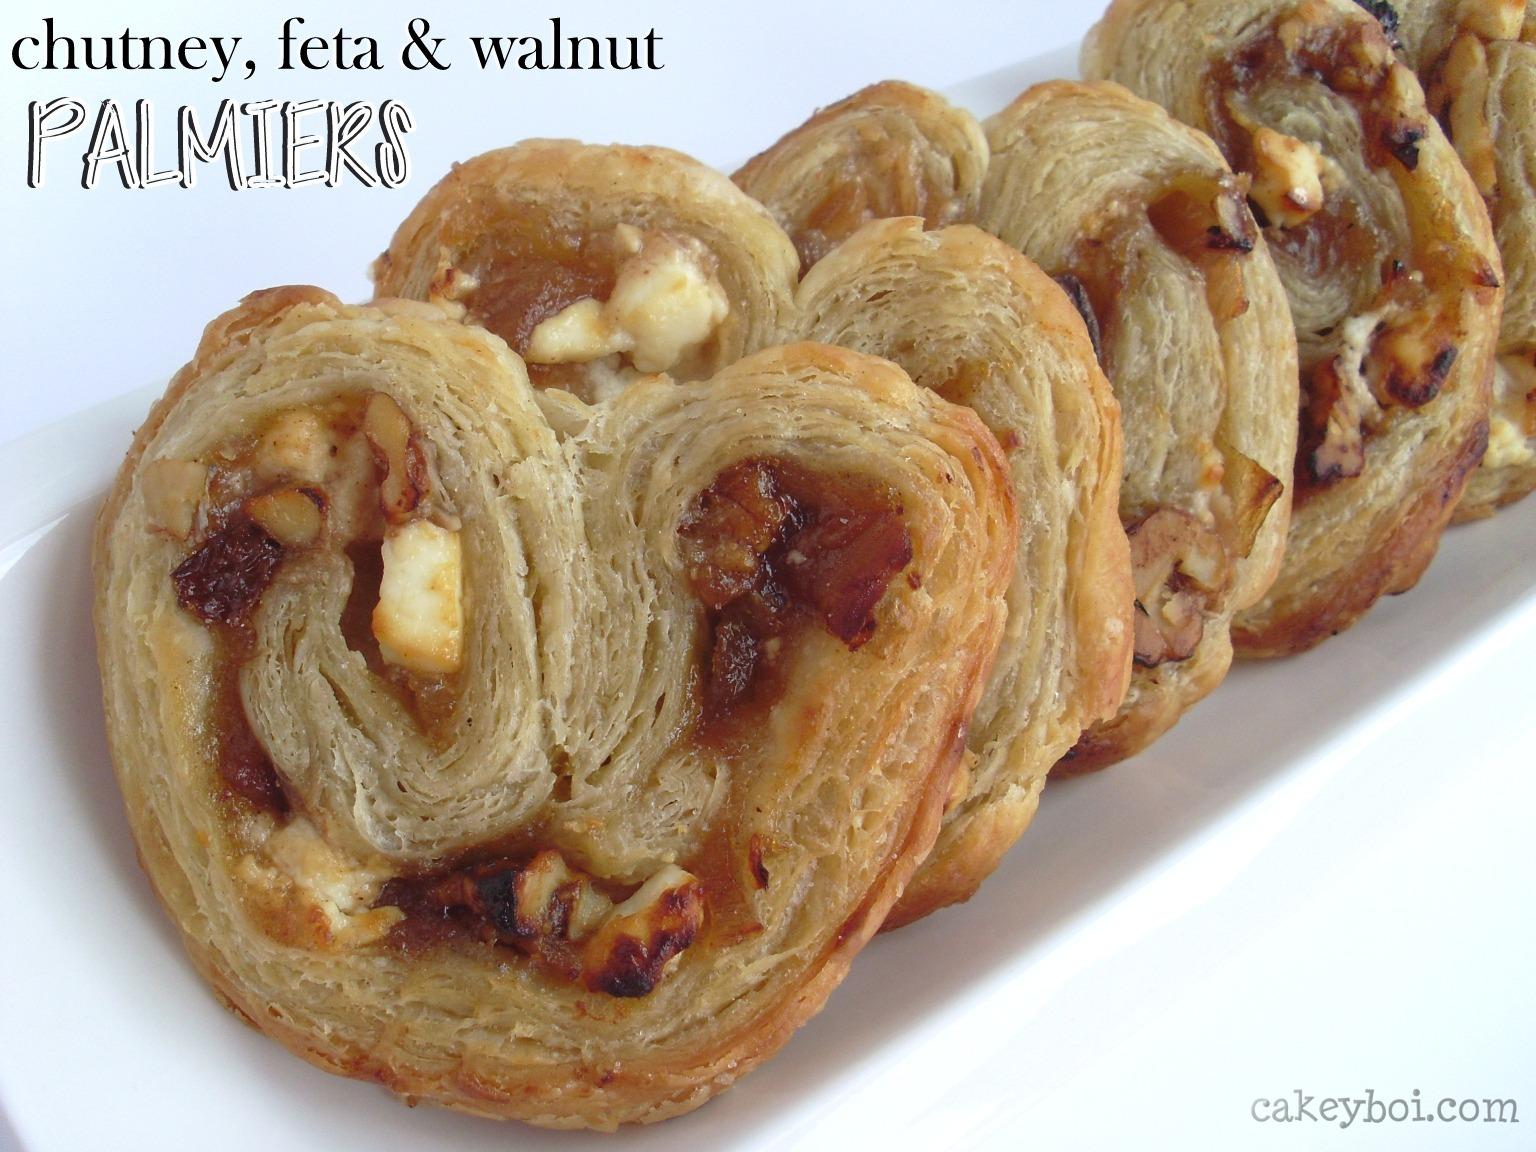 Chutney, Feta and Walnut Palmiers - for Organic September